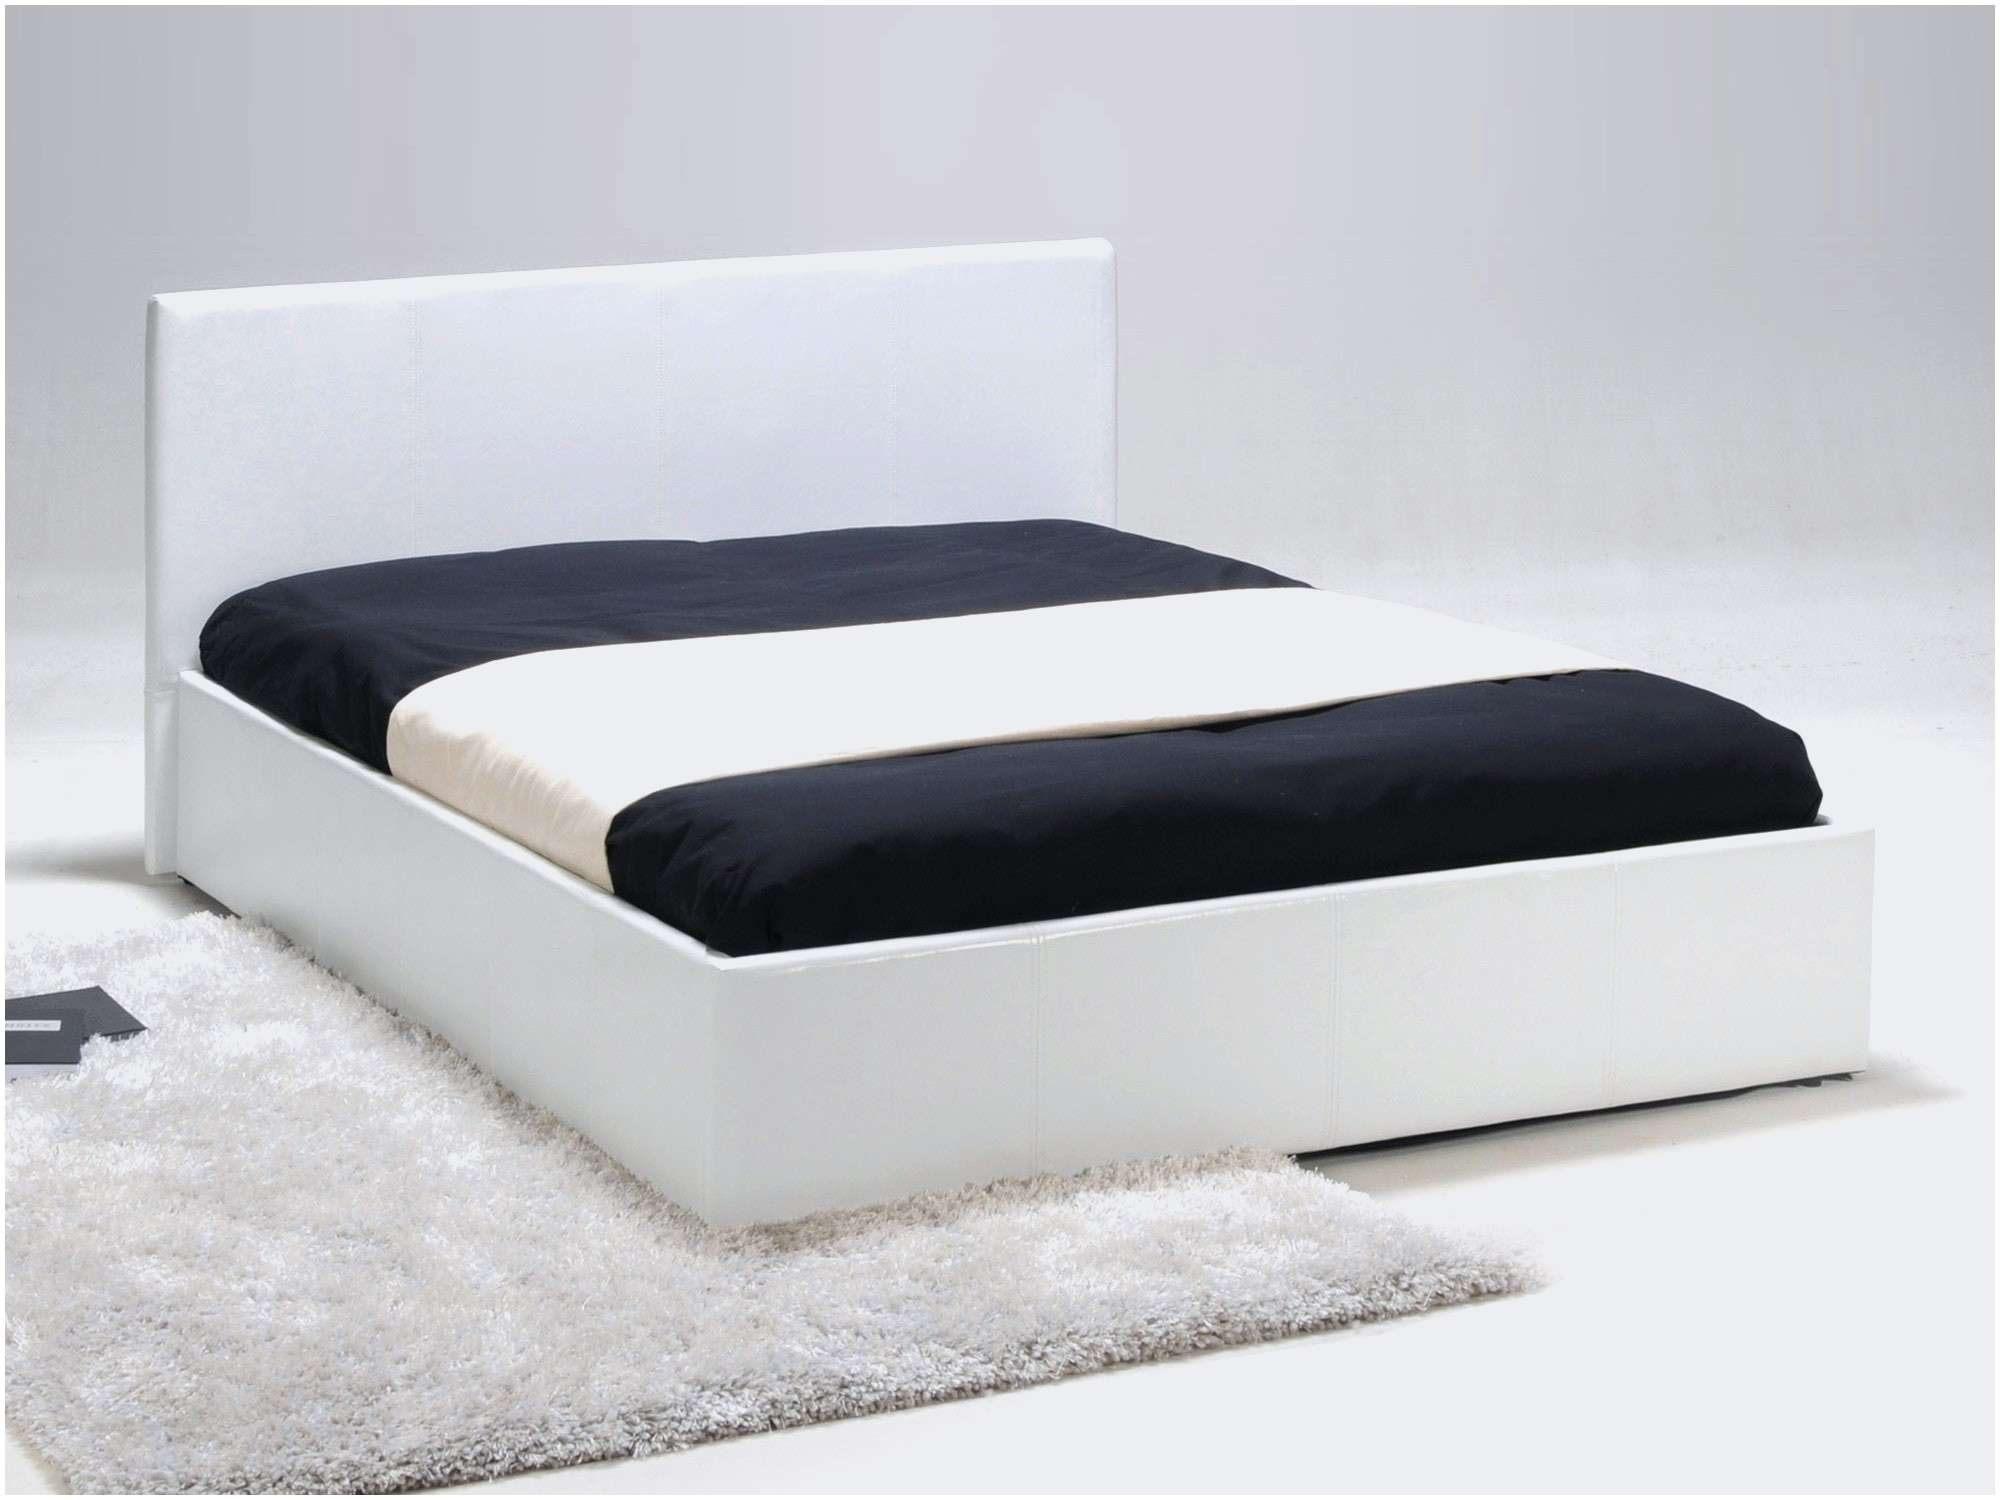 Beau Ikea Parure Pour Alternative Drap De Lit Ikea Jongor4hire